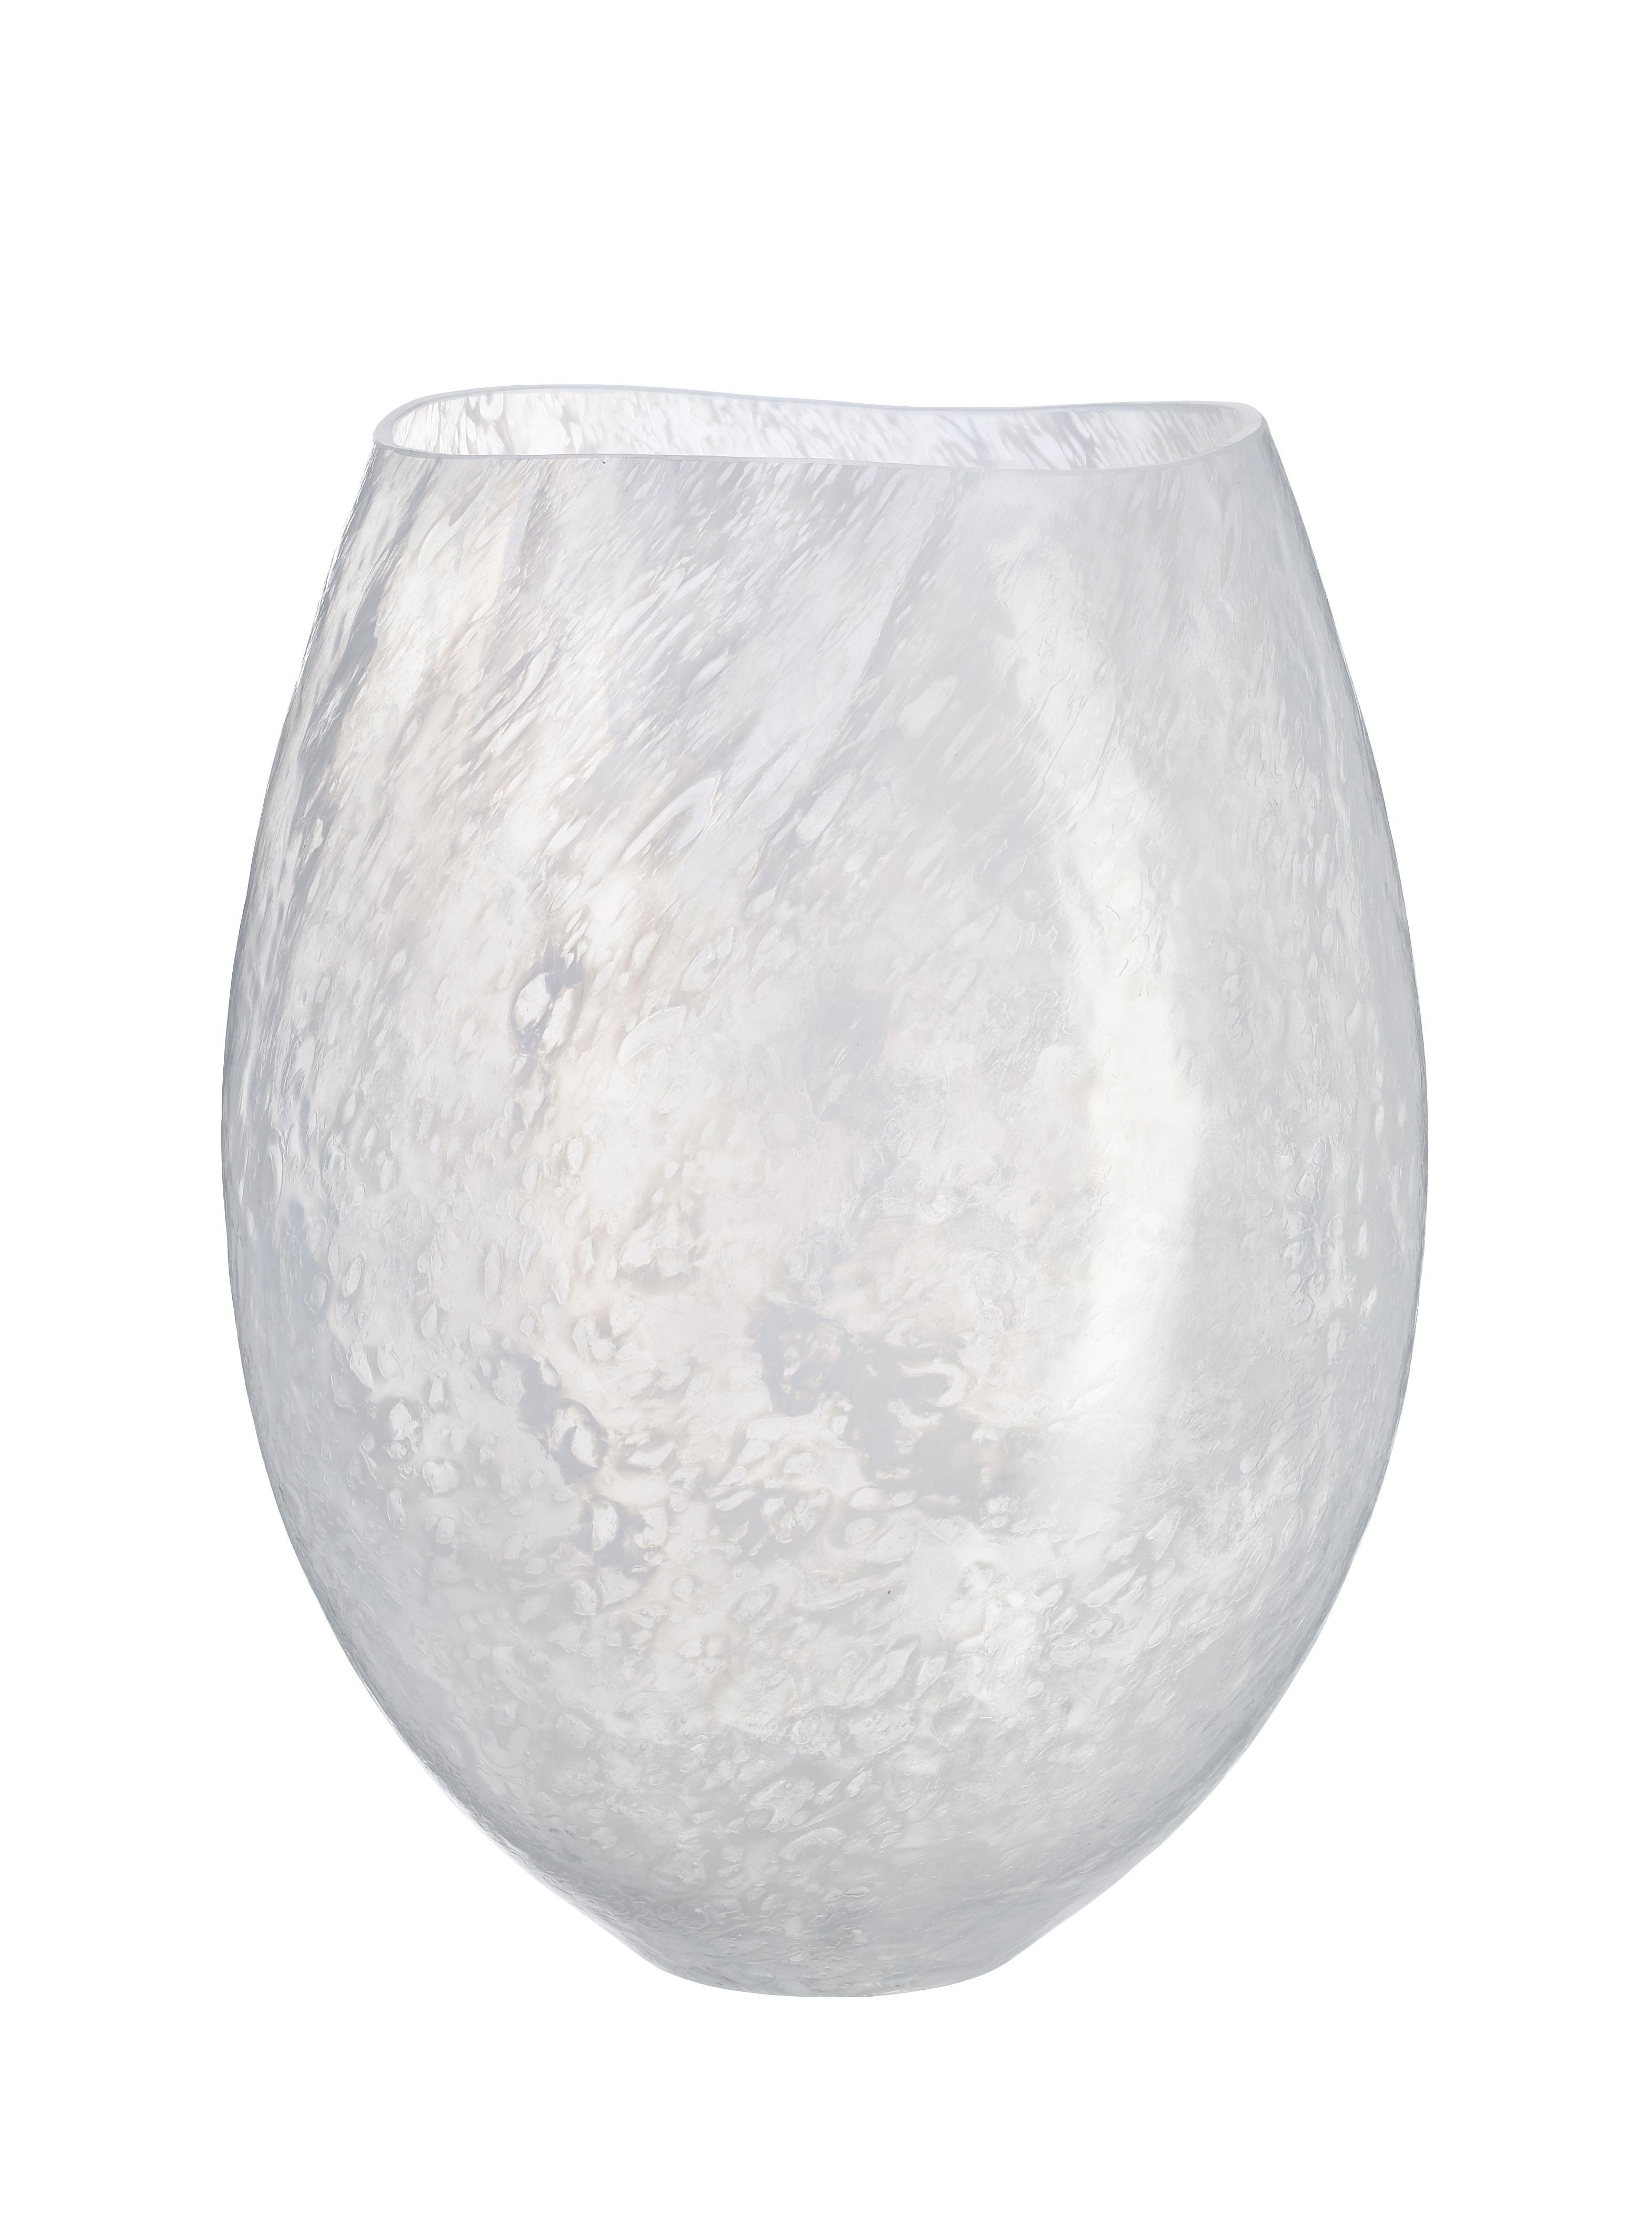 Kosta Boda Vaas.Kosta Boda Dino Burgundy Vase By Kjell Engman Kosta Boda